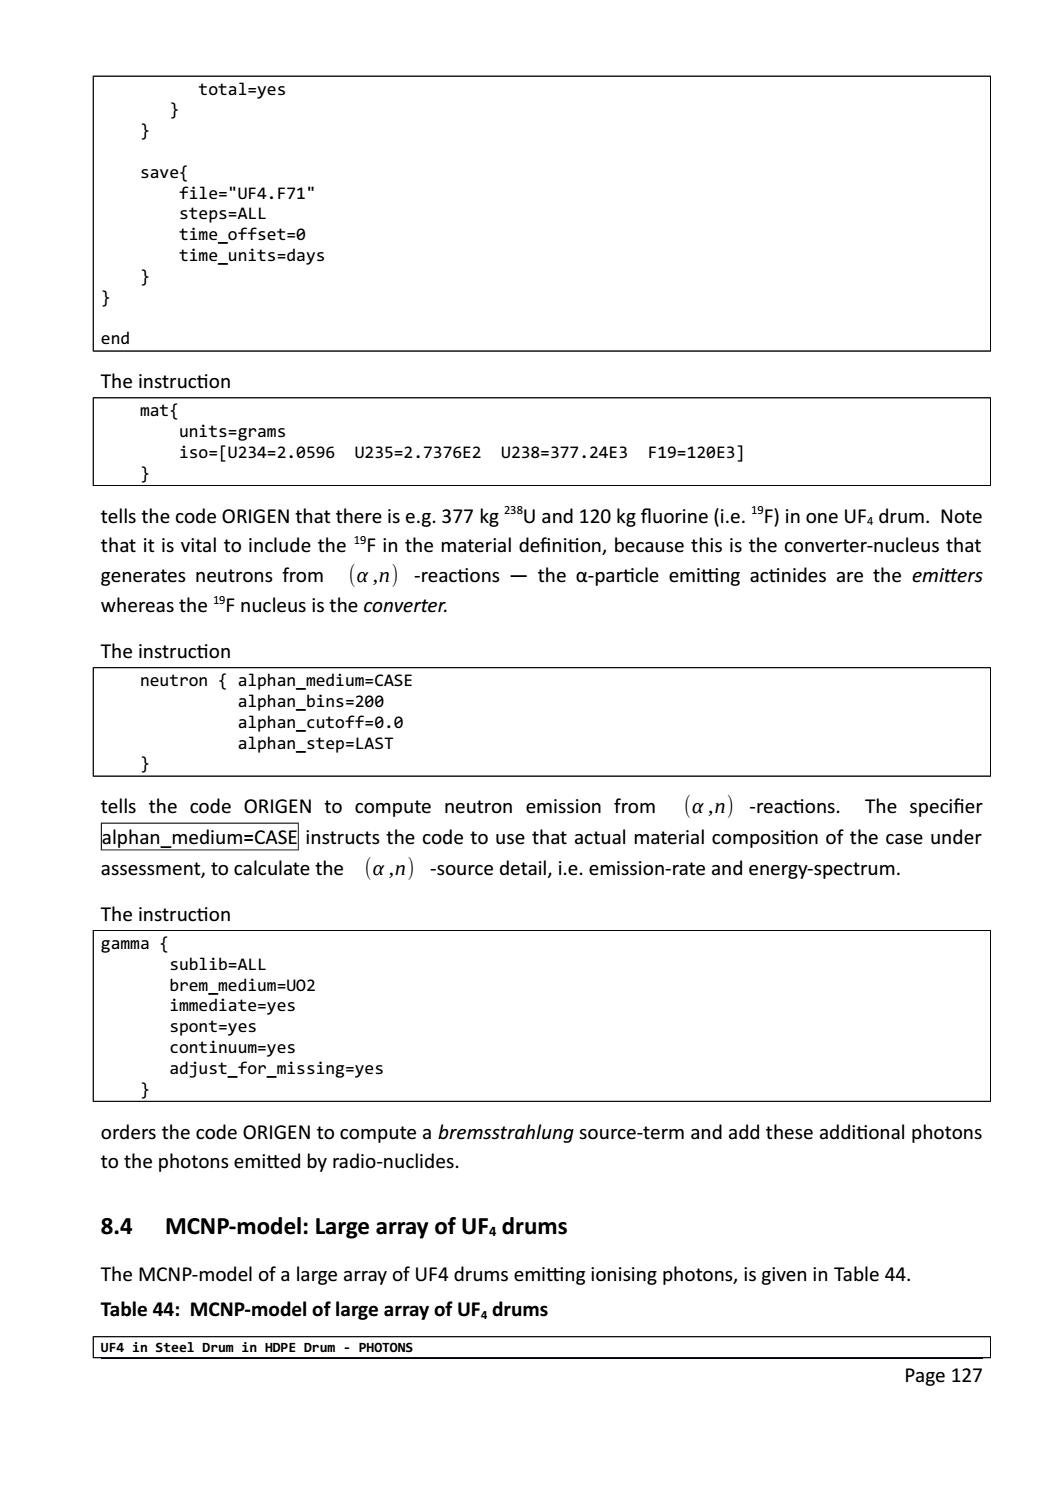 RADIOACTIVE WASTE: COMPUTATIONAL CHARACTERISATION and SHIELDING page 152